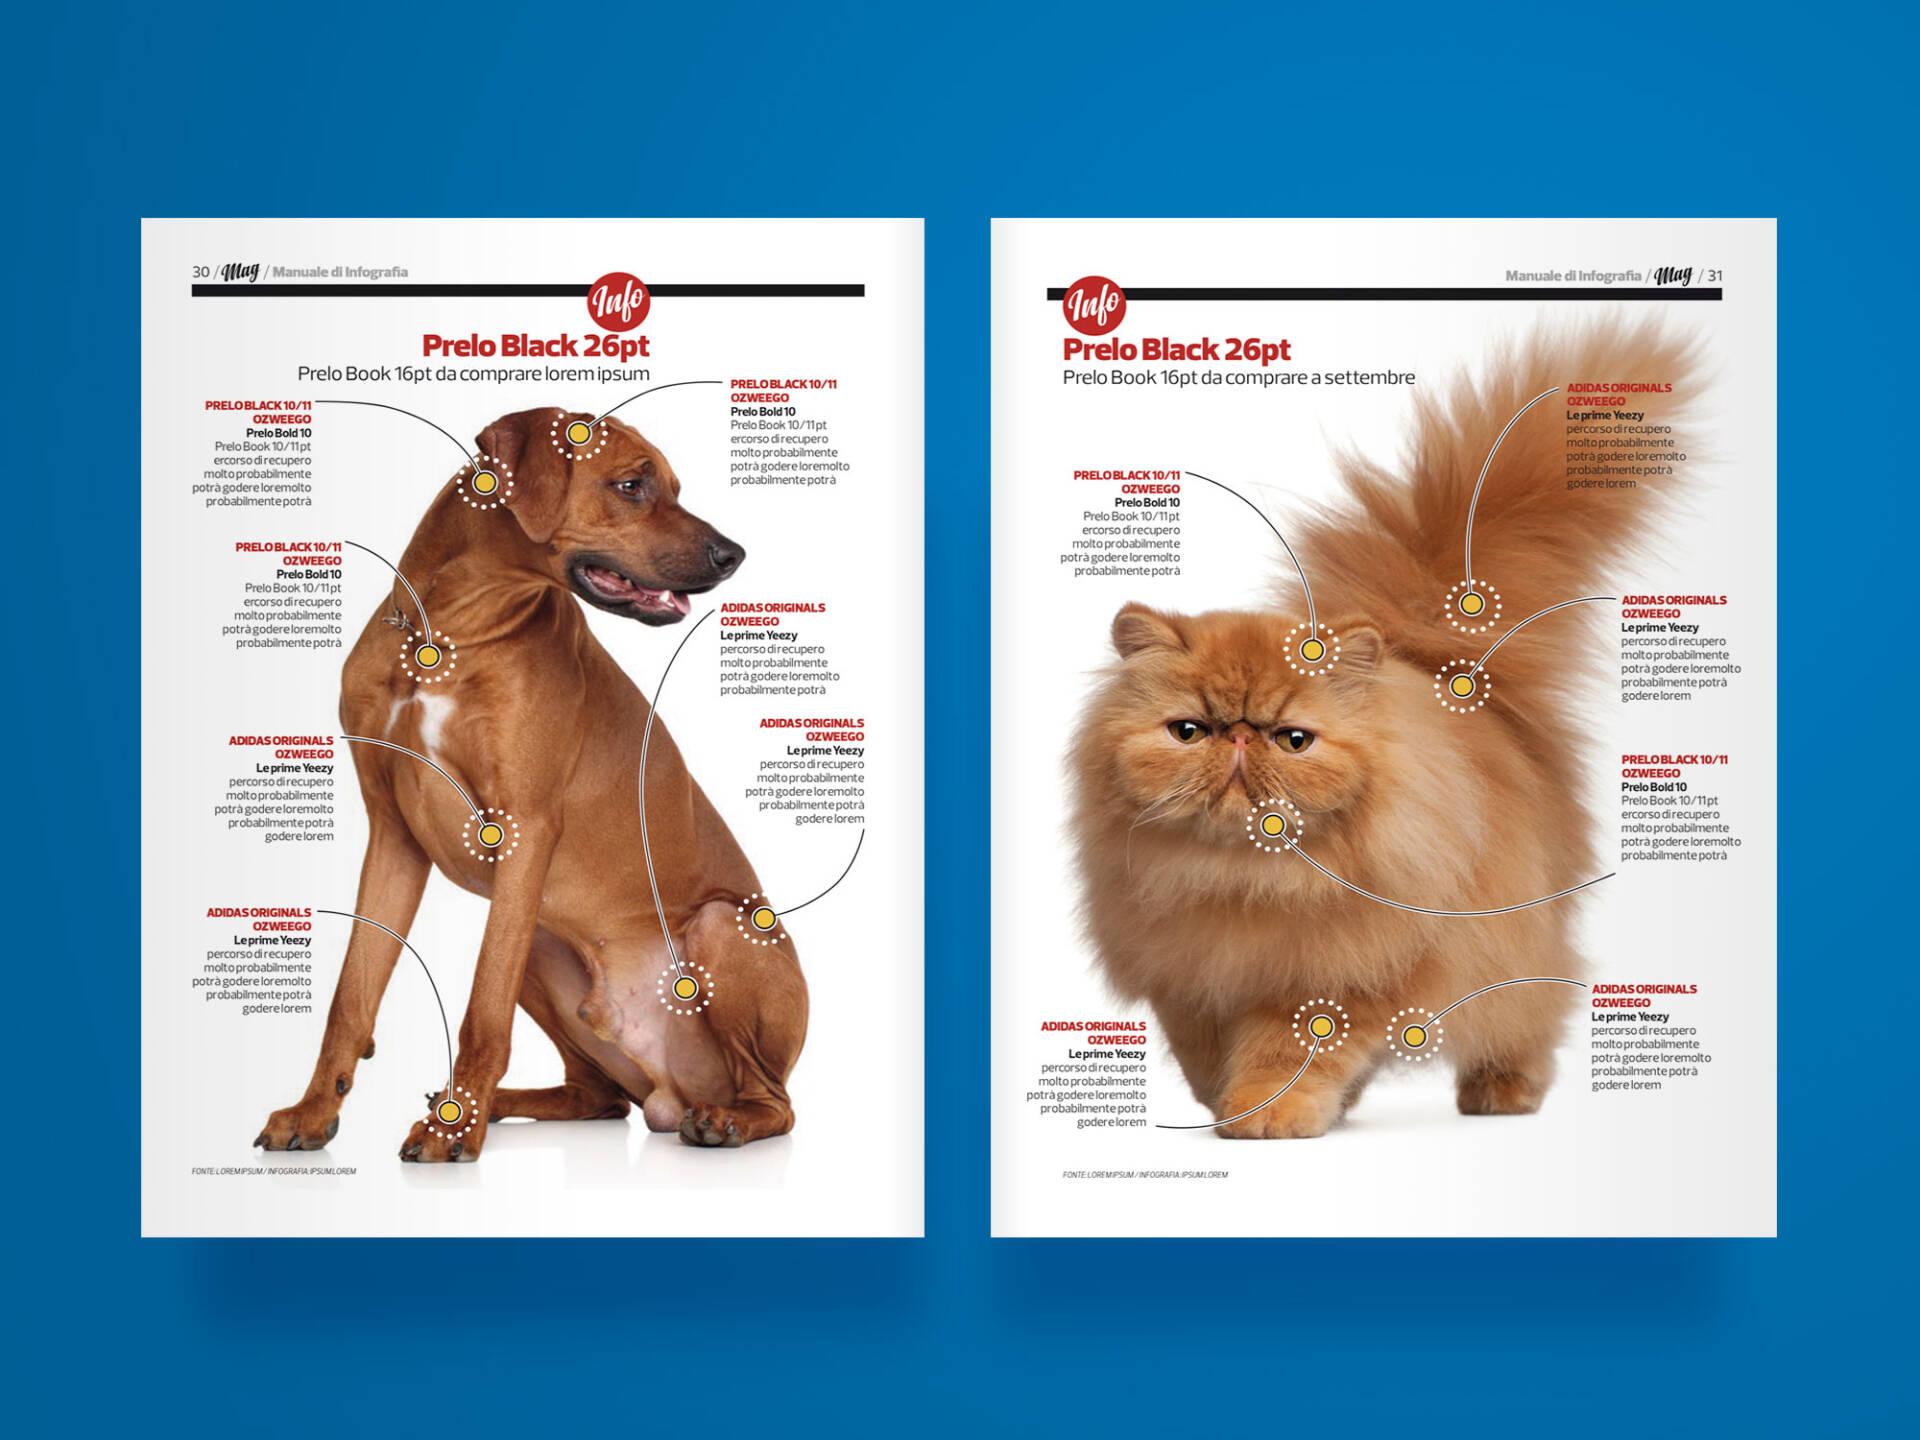 MAG_infographics_03_Wenceslau_News_Design